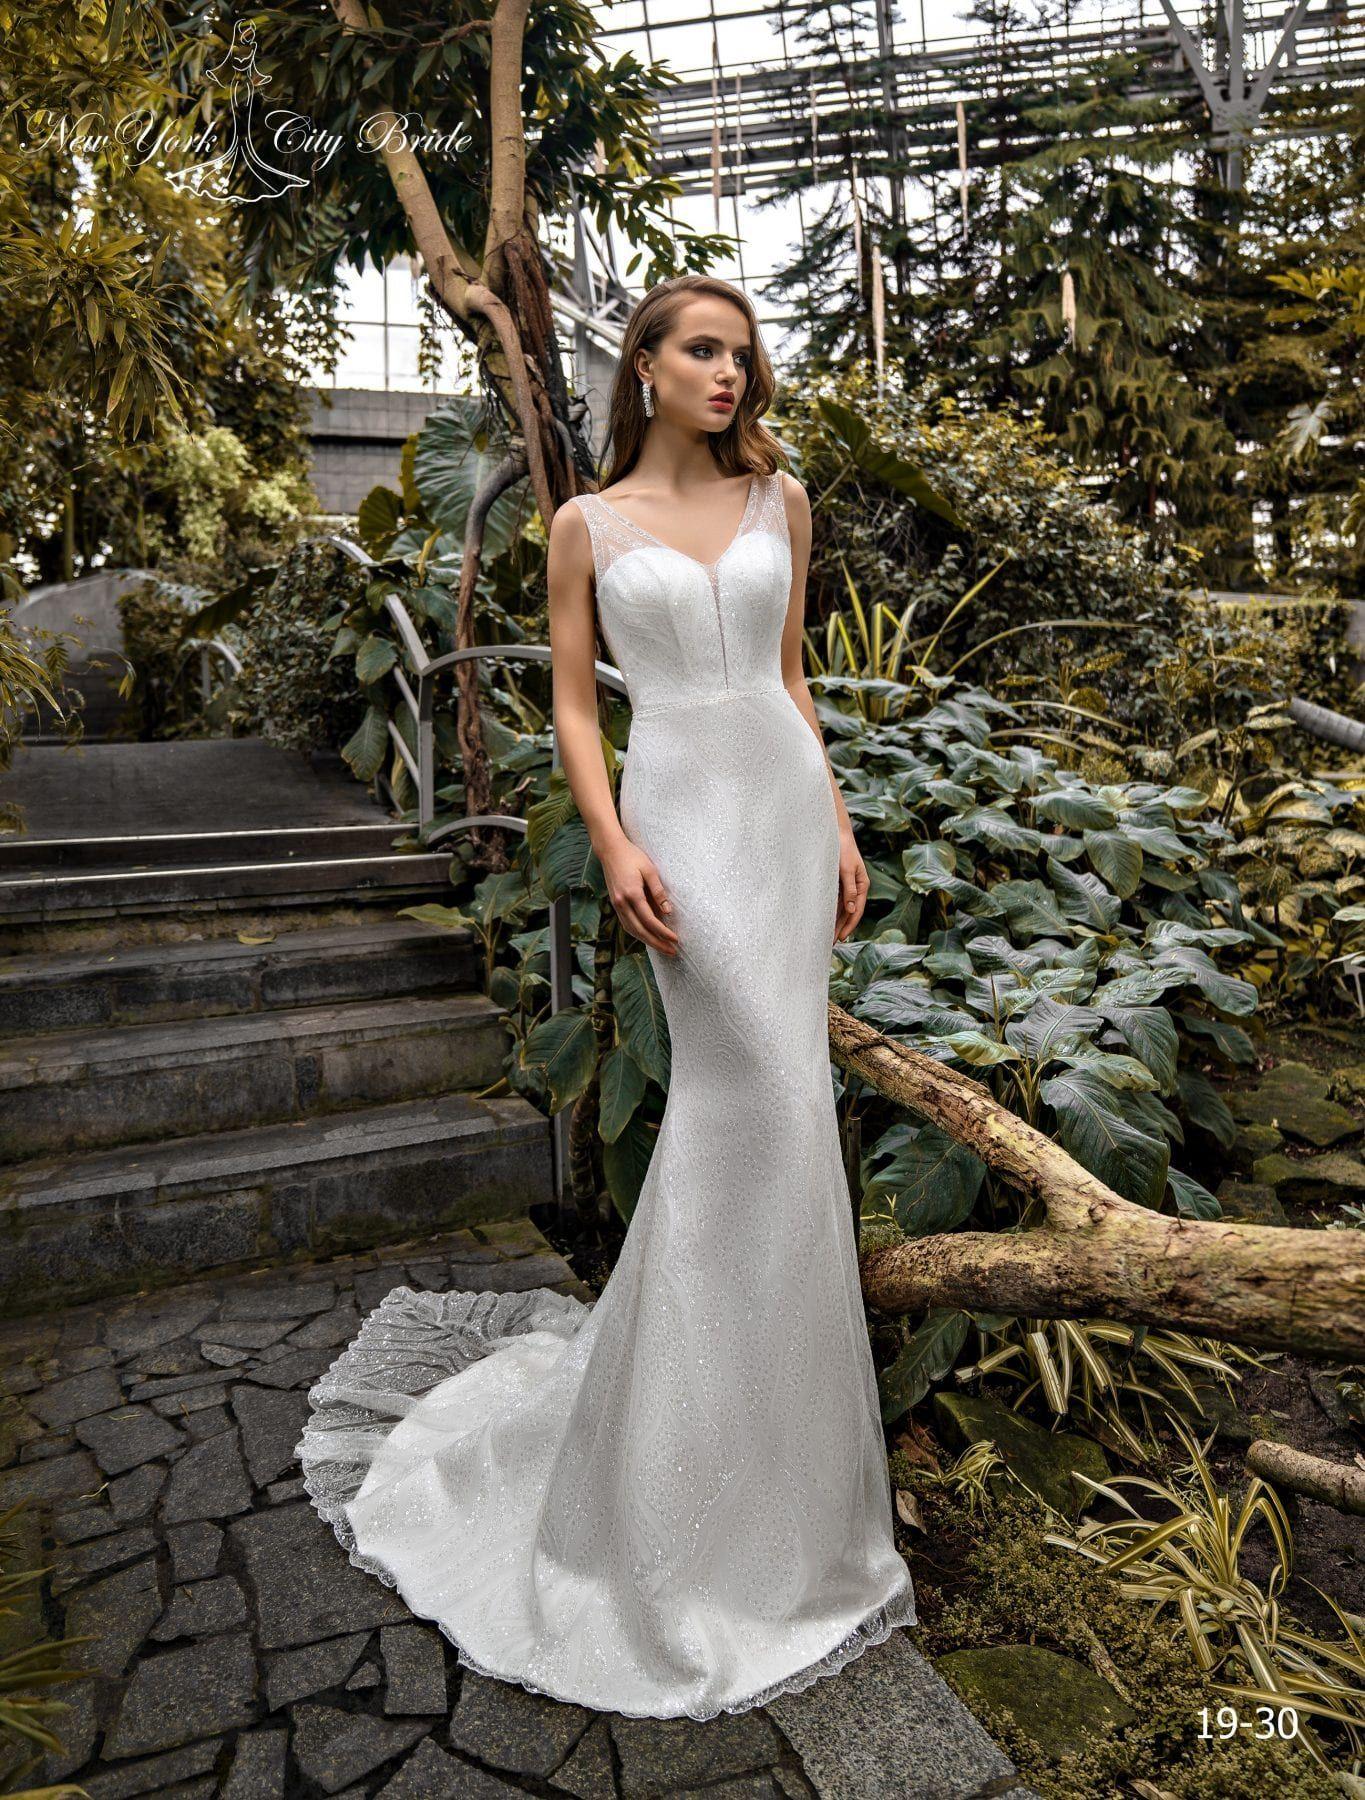 Wedding Dress Riya For Sale At Ny City Bride Wedding Dresses